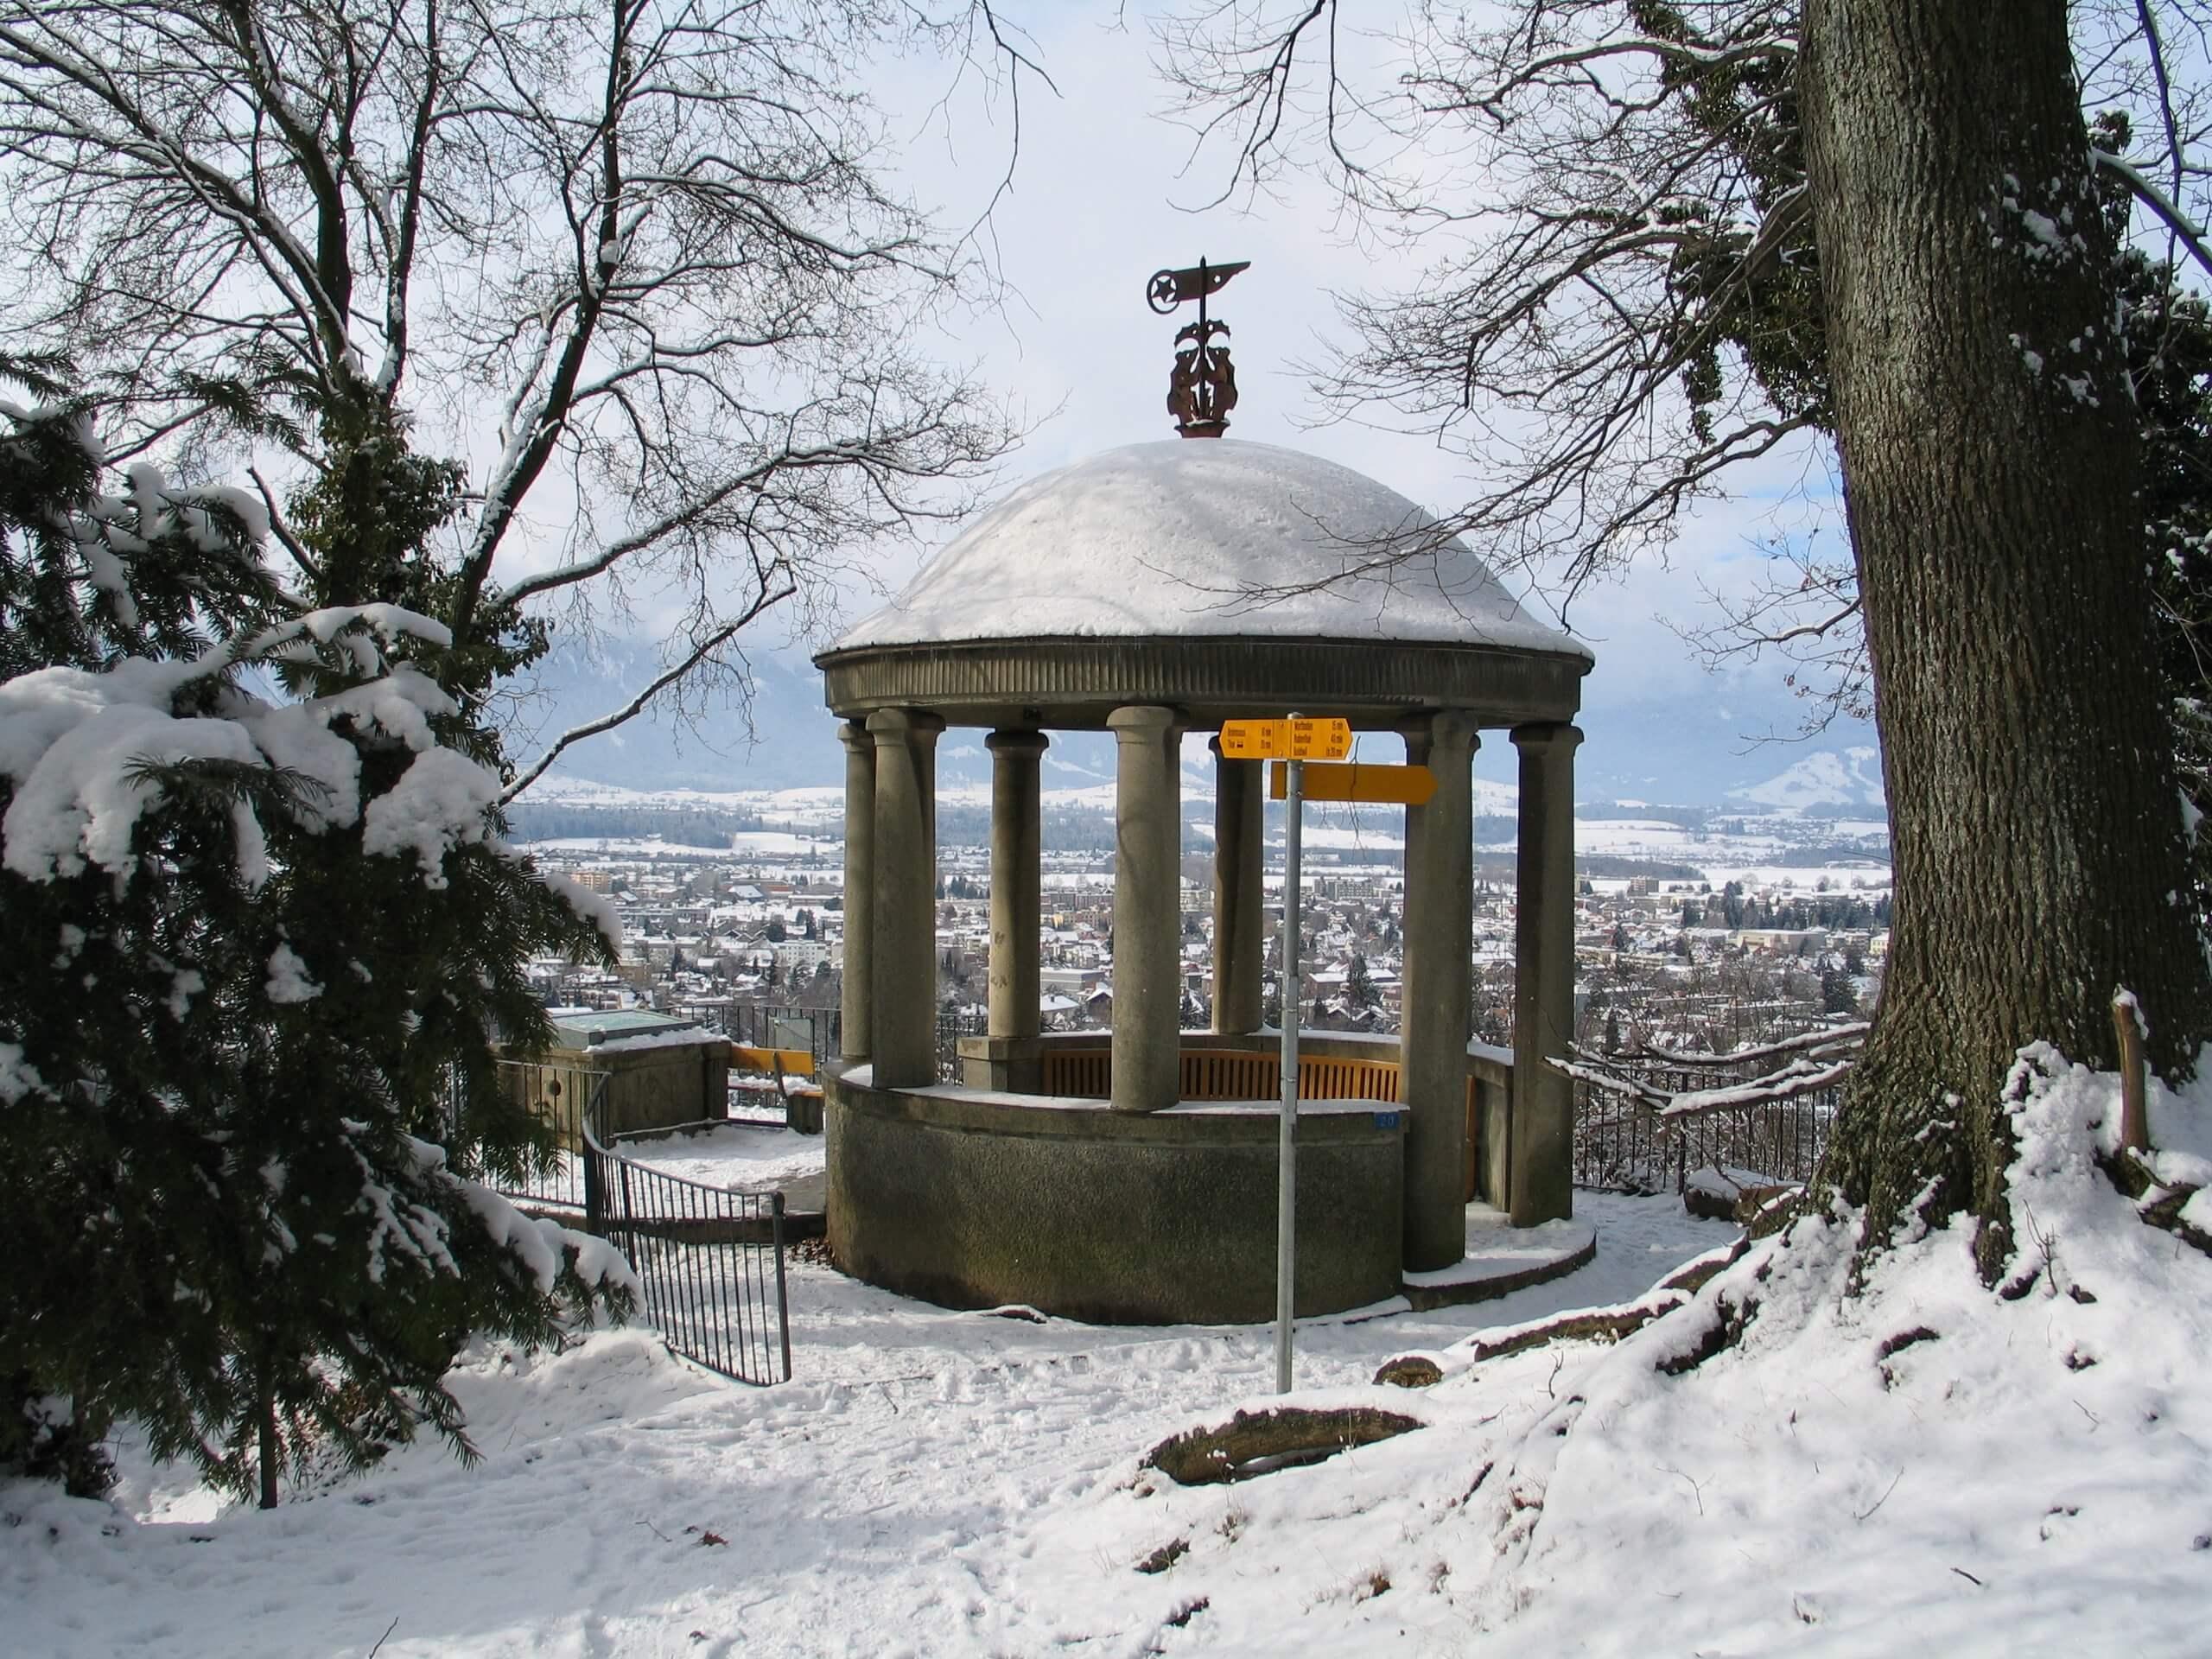 thun-jakobshuebeli-aussichtsplattform-winter-schnee